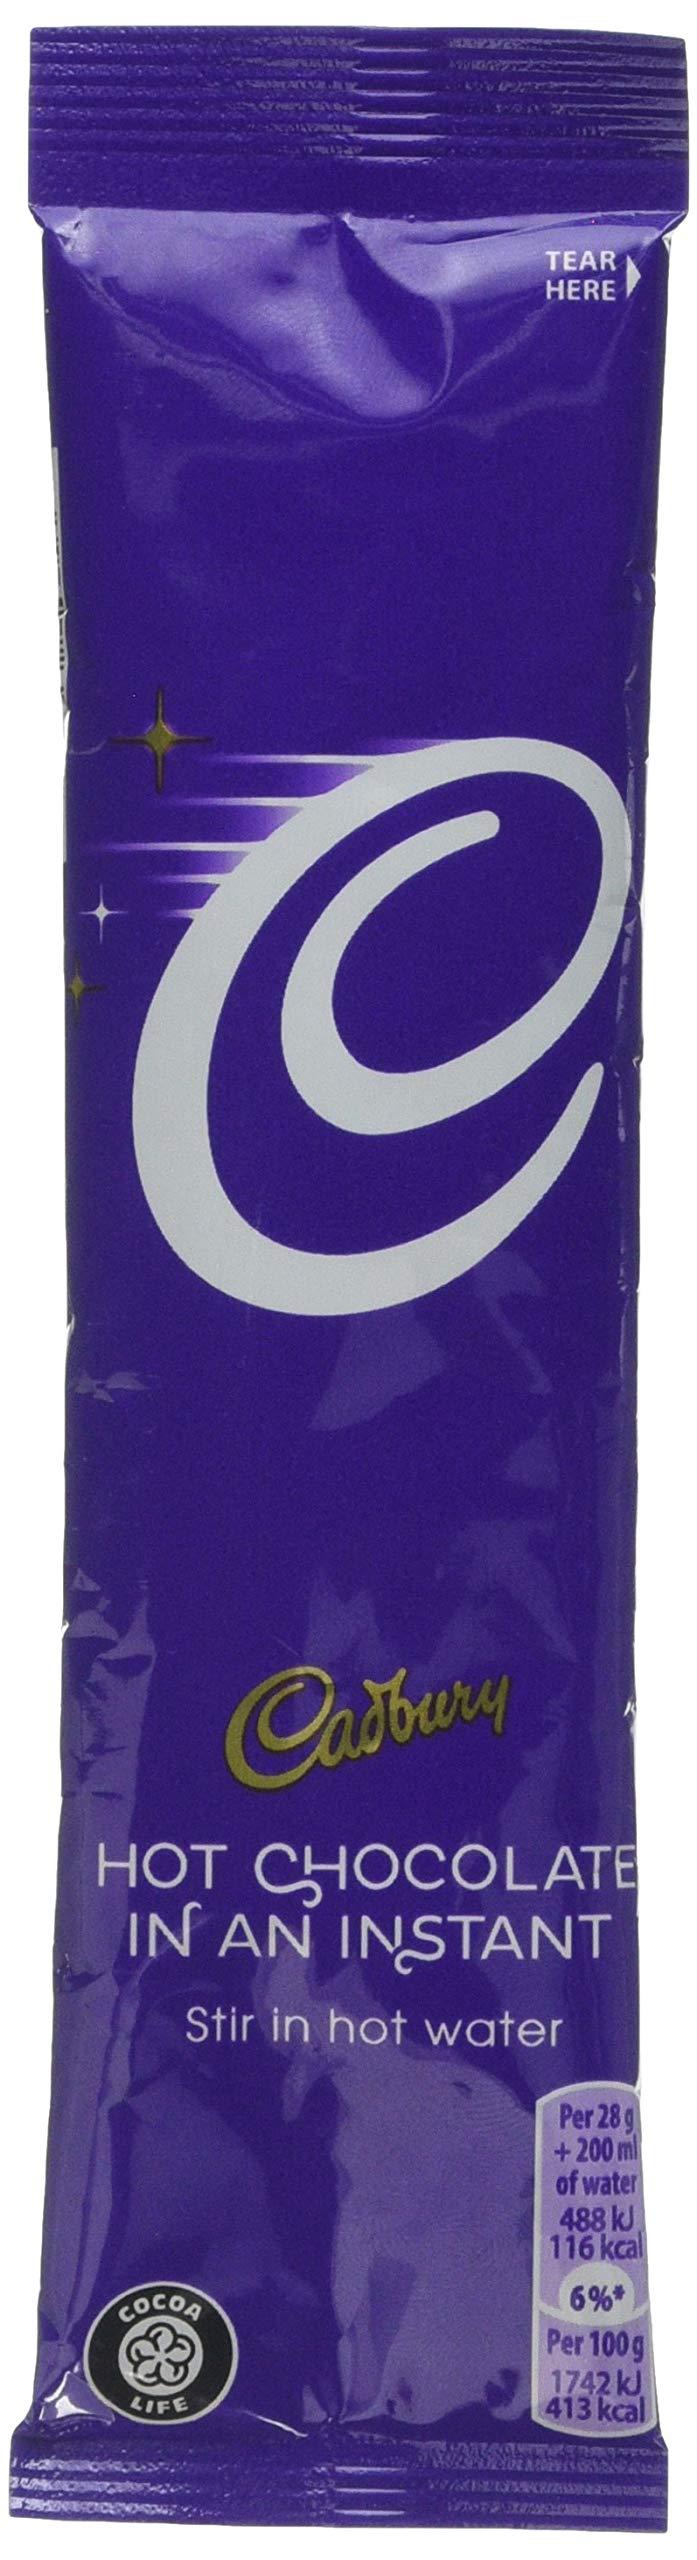 Cadbury Instant Hot Chocolate Sachets 28 g (Pack of 50)